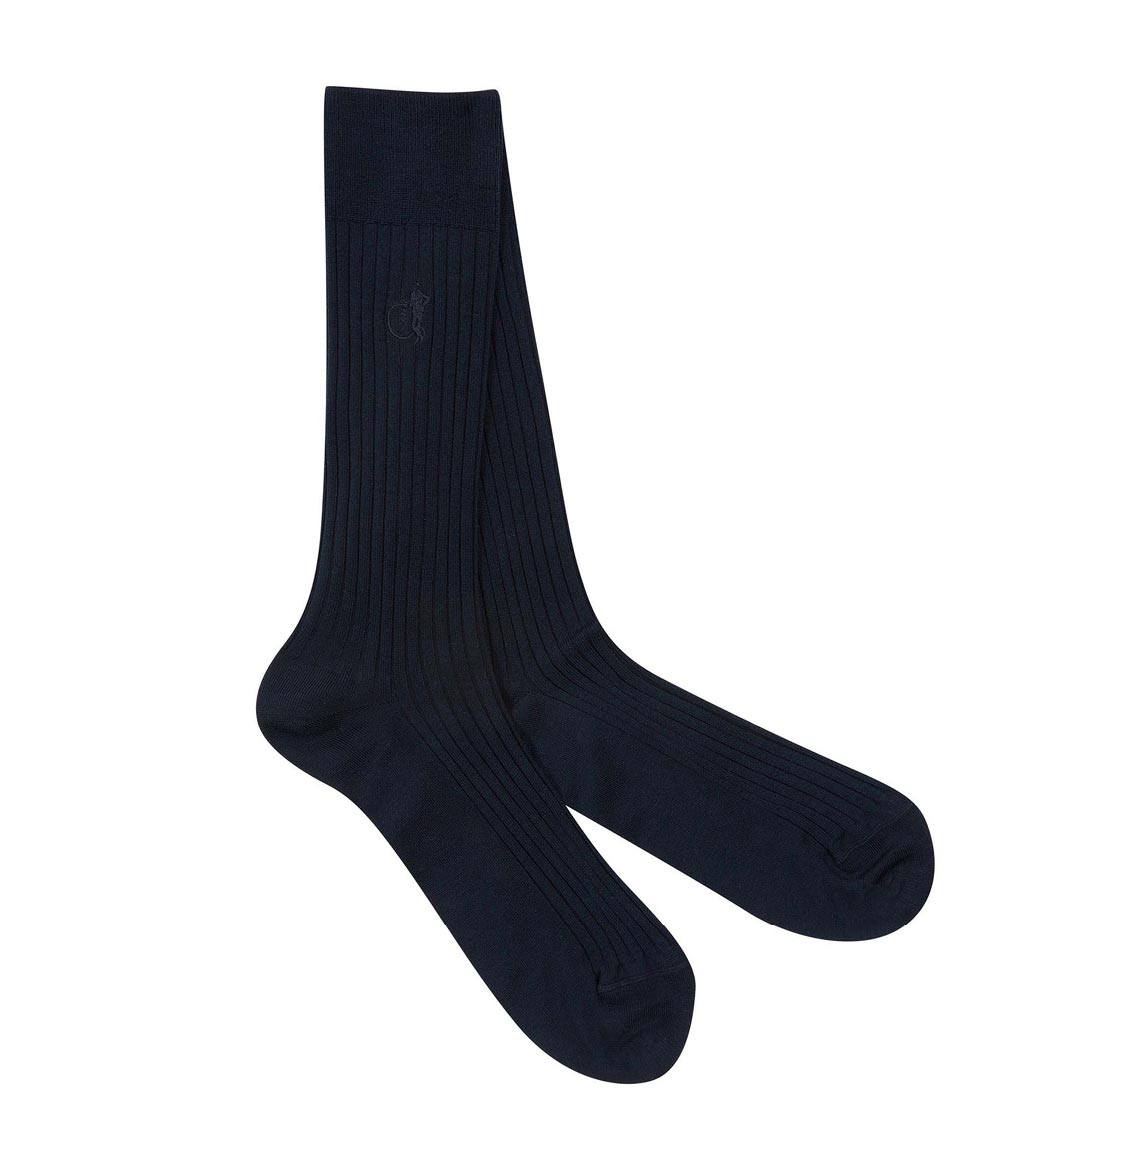 London Sock Co Simply Sartorial Socks Royal Navy